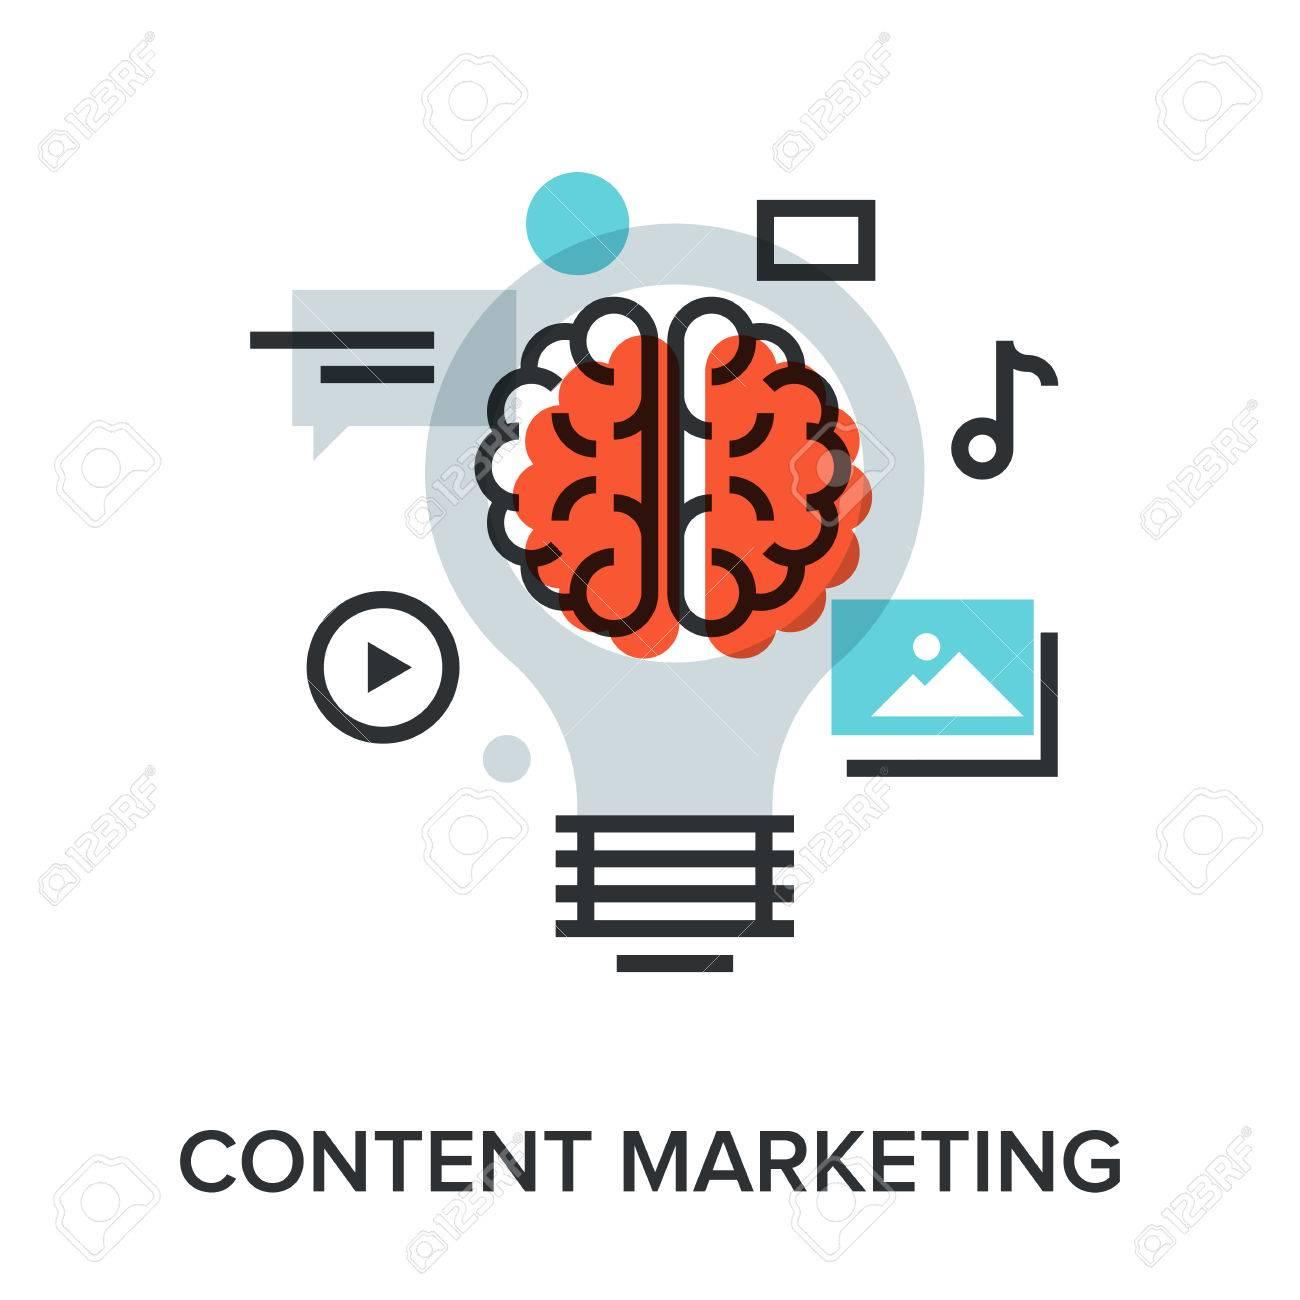 Vector illustration of content marketing flat line design concept. - 46347868